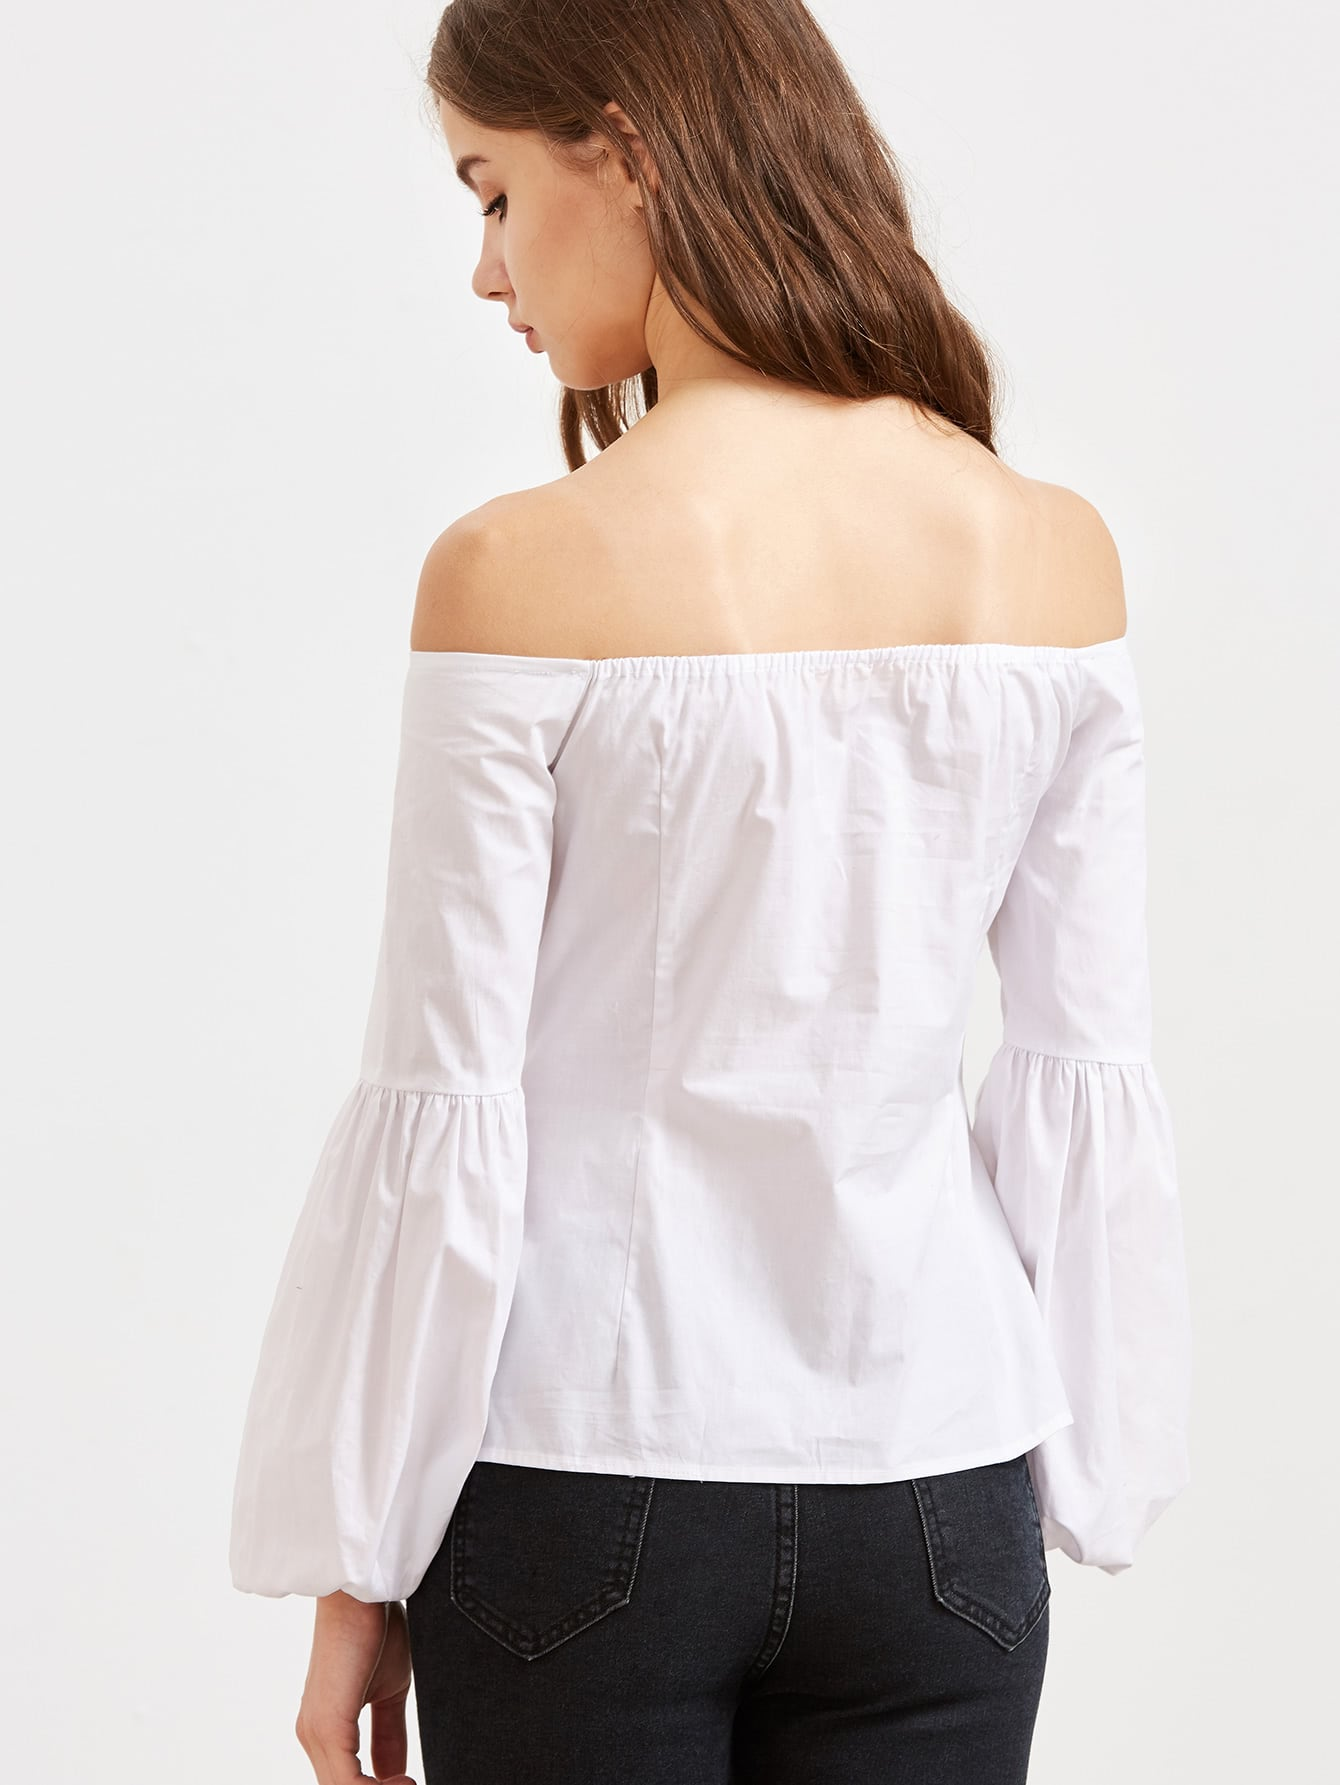 blouse170214705_2